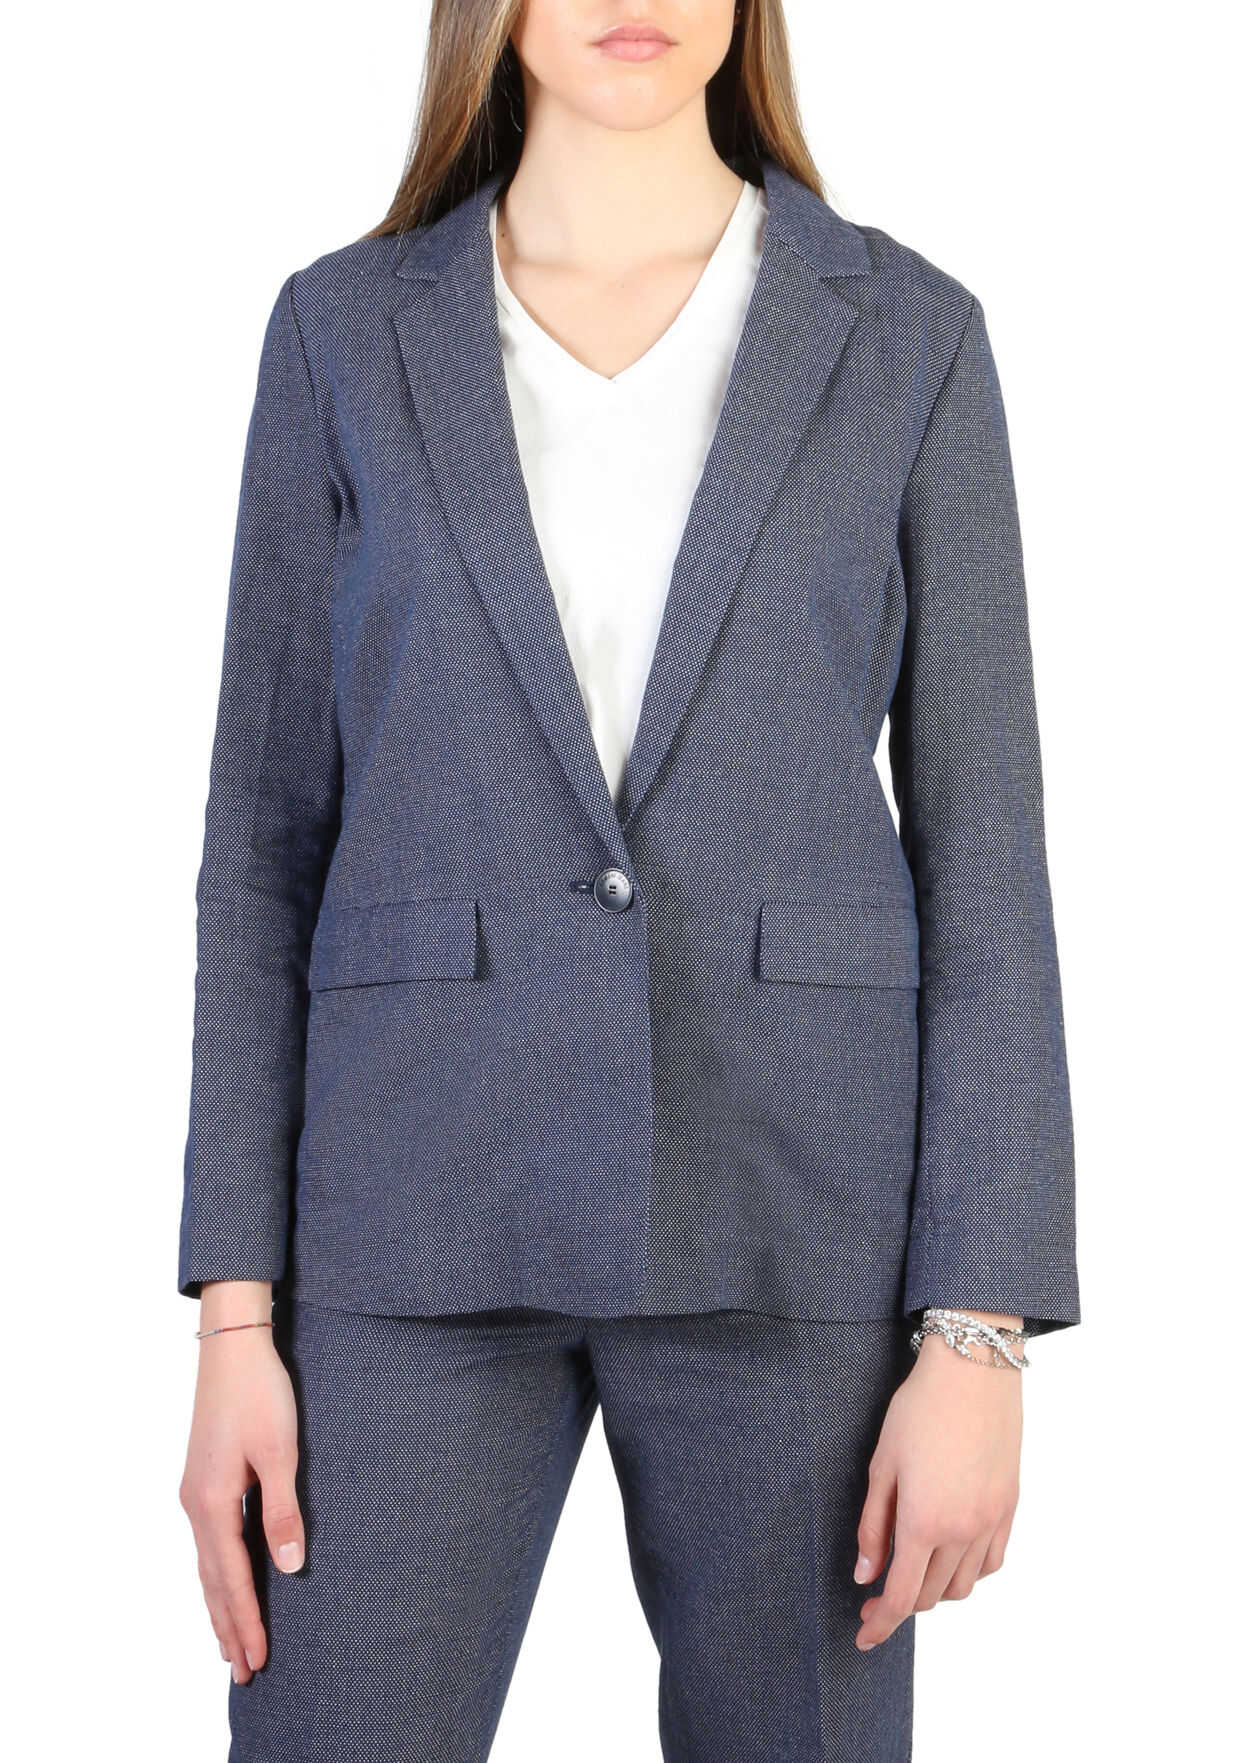 Armani Jeans 3Y5G42_5Nylz BLUE